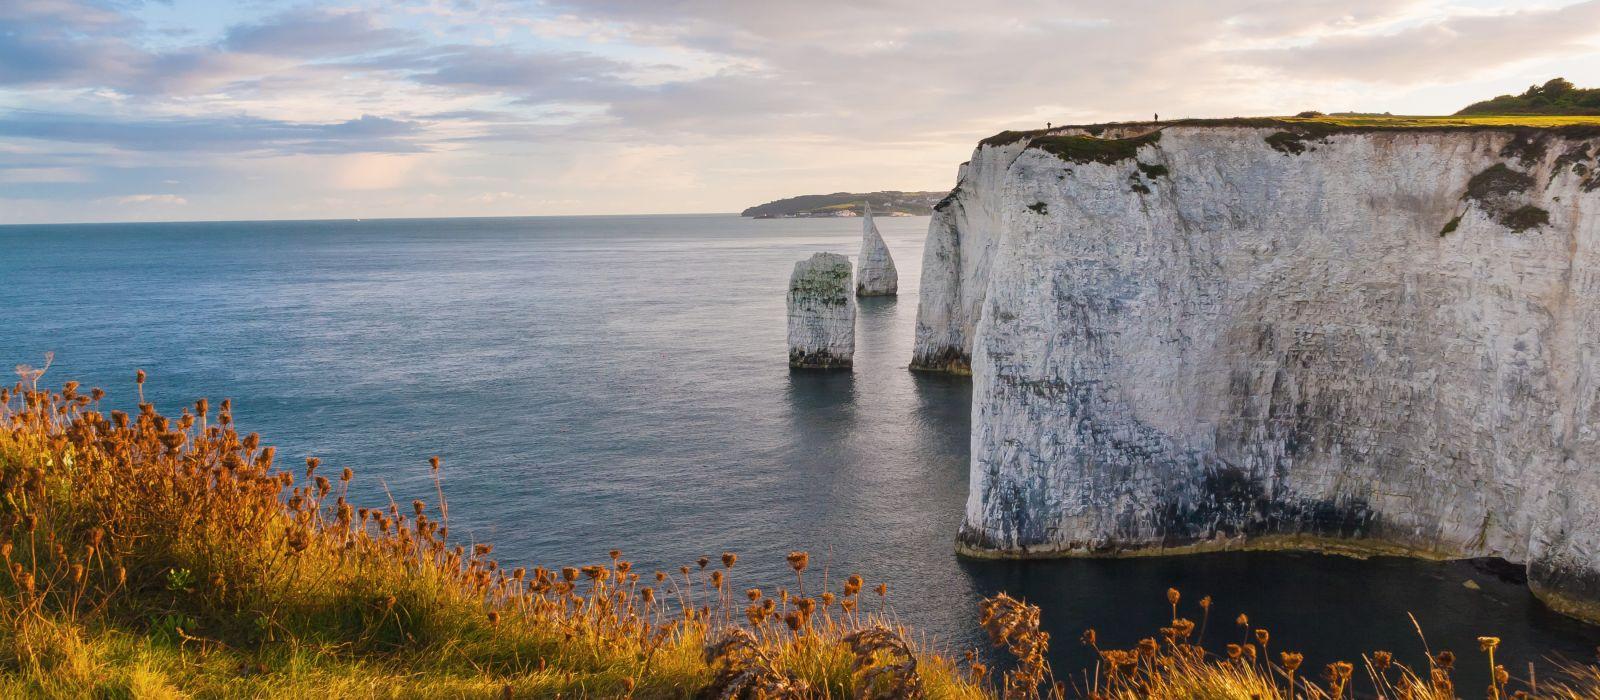 Evening light at Old Harry Rocks Dorset England UK Europe